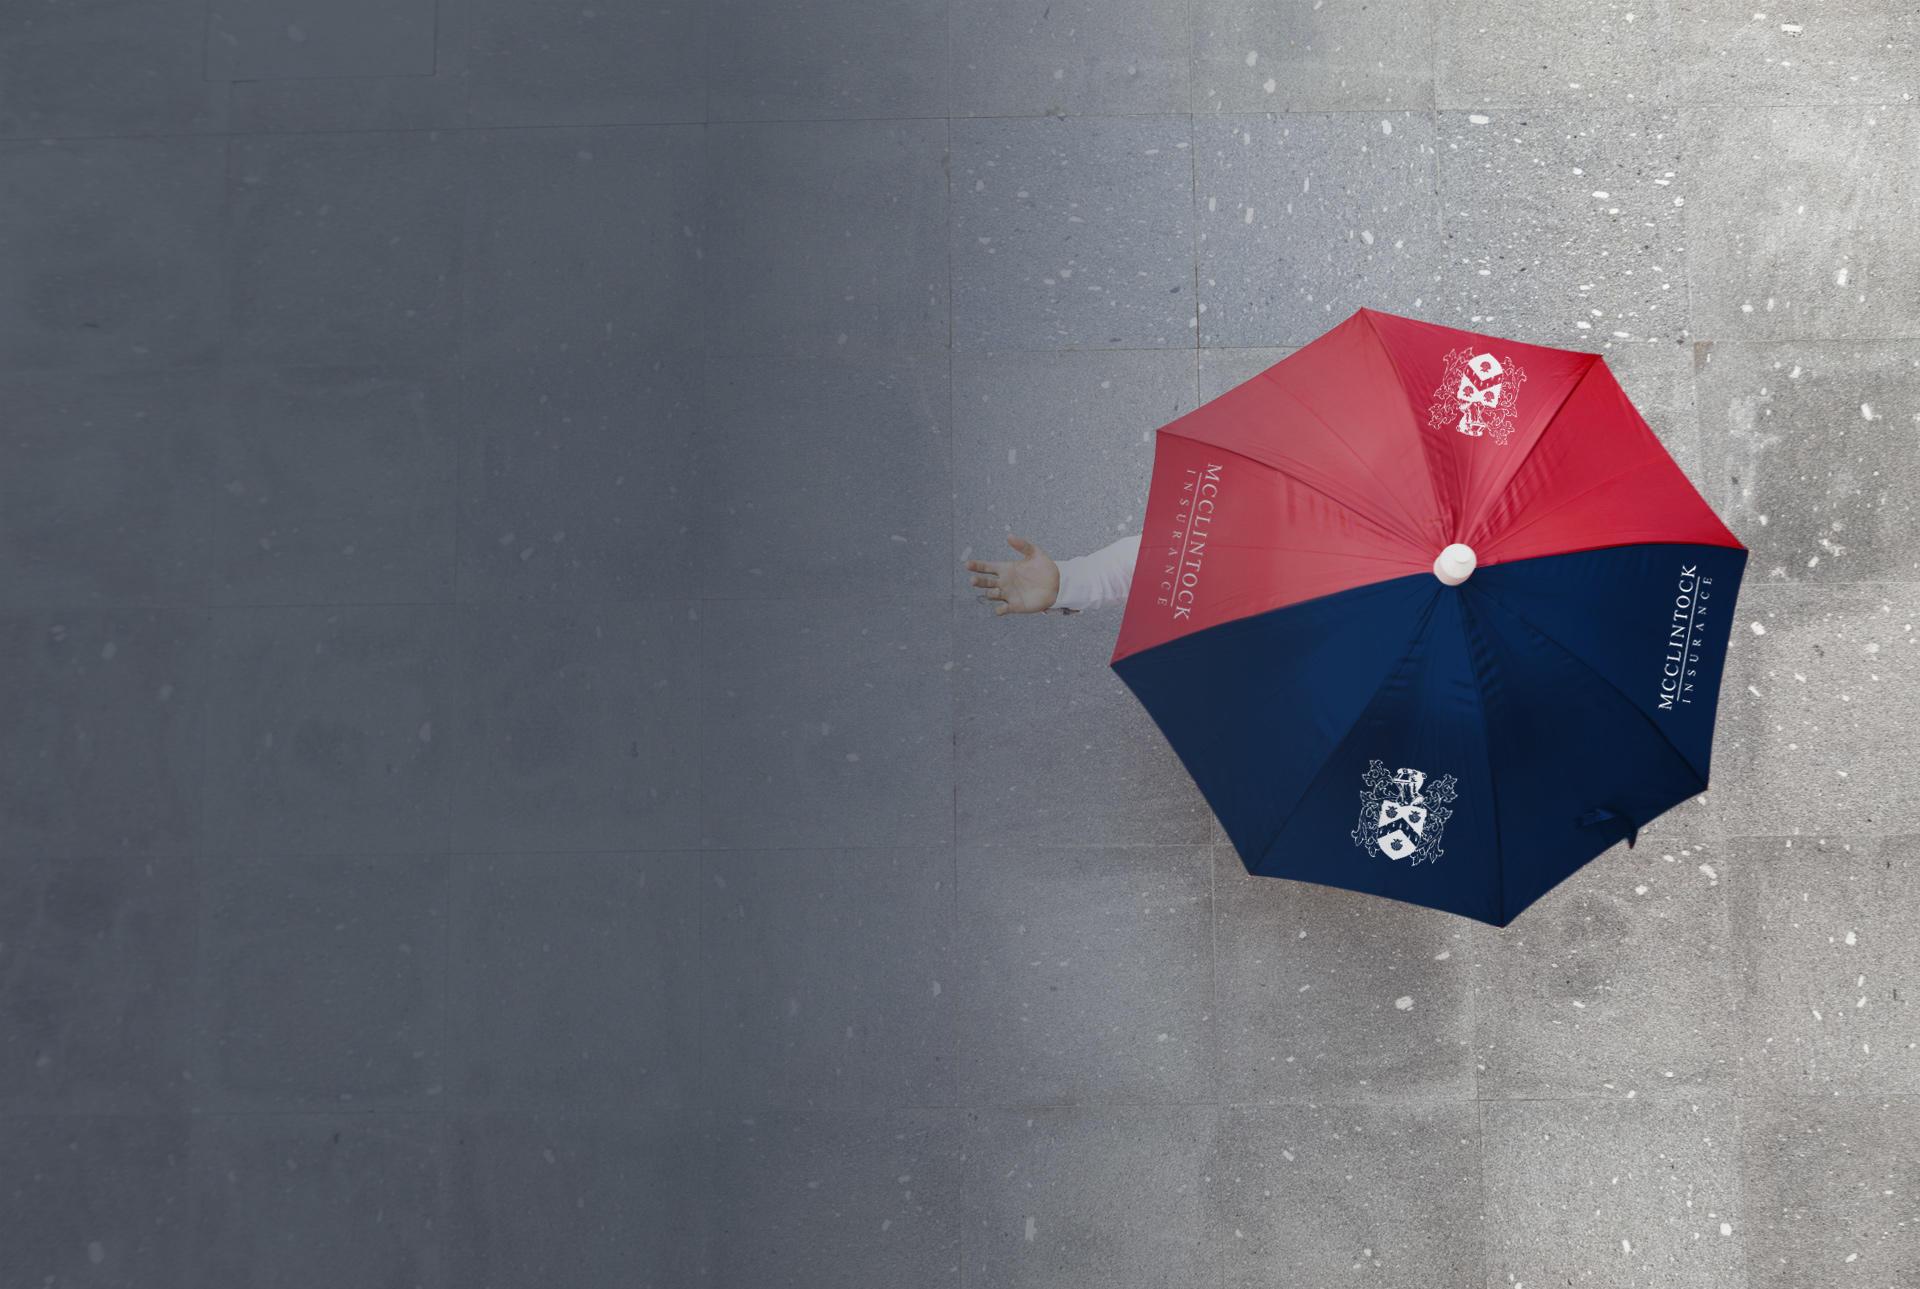 McClintock Insurance Agency image 0